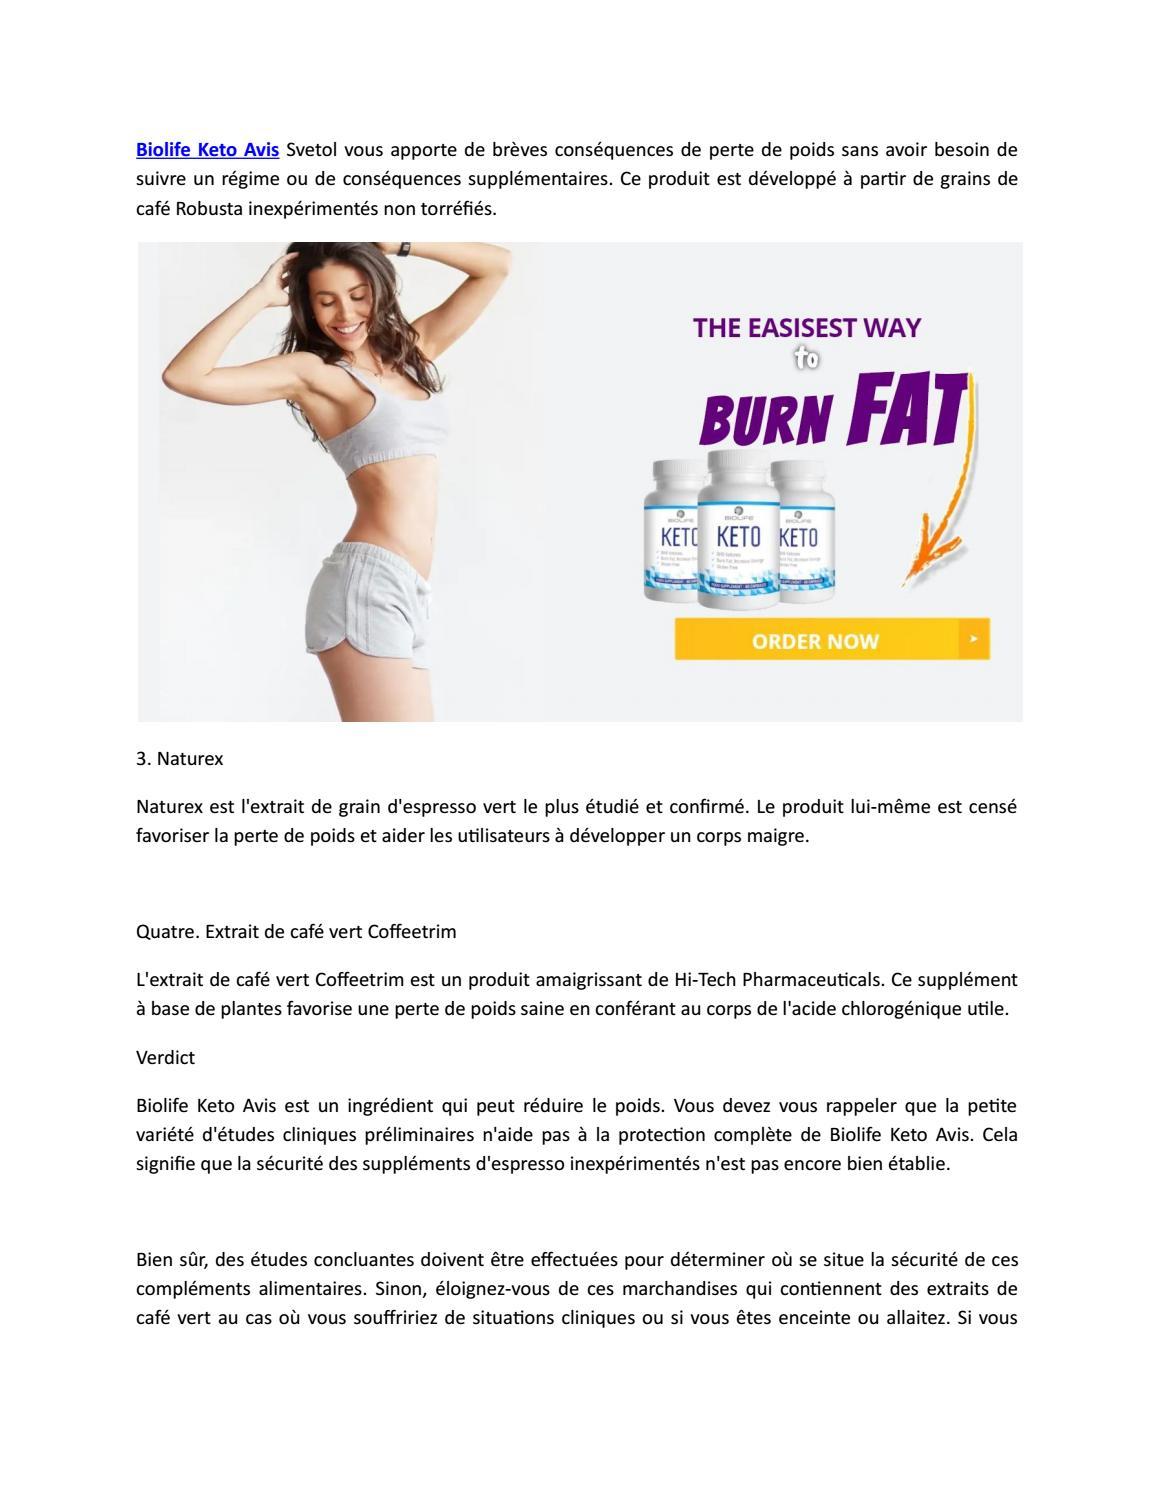 matt manning perte de poids température ambiante de perte de poids